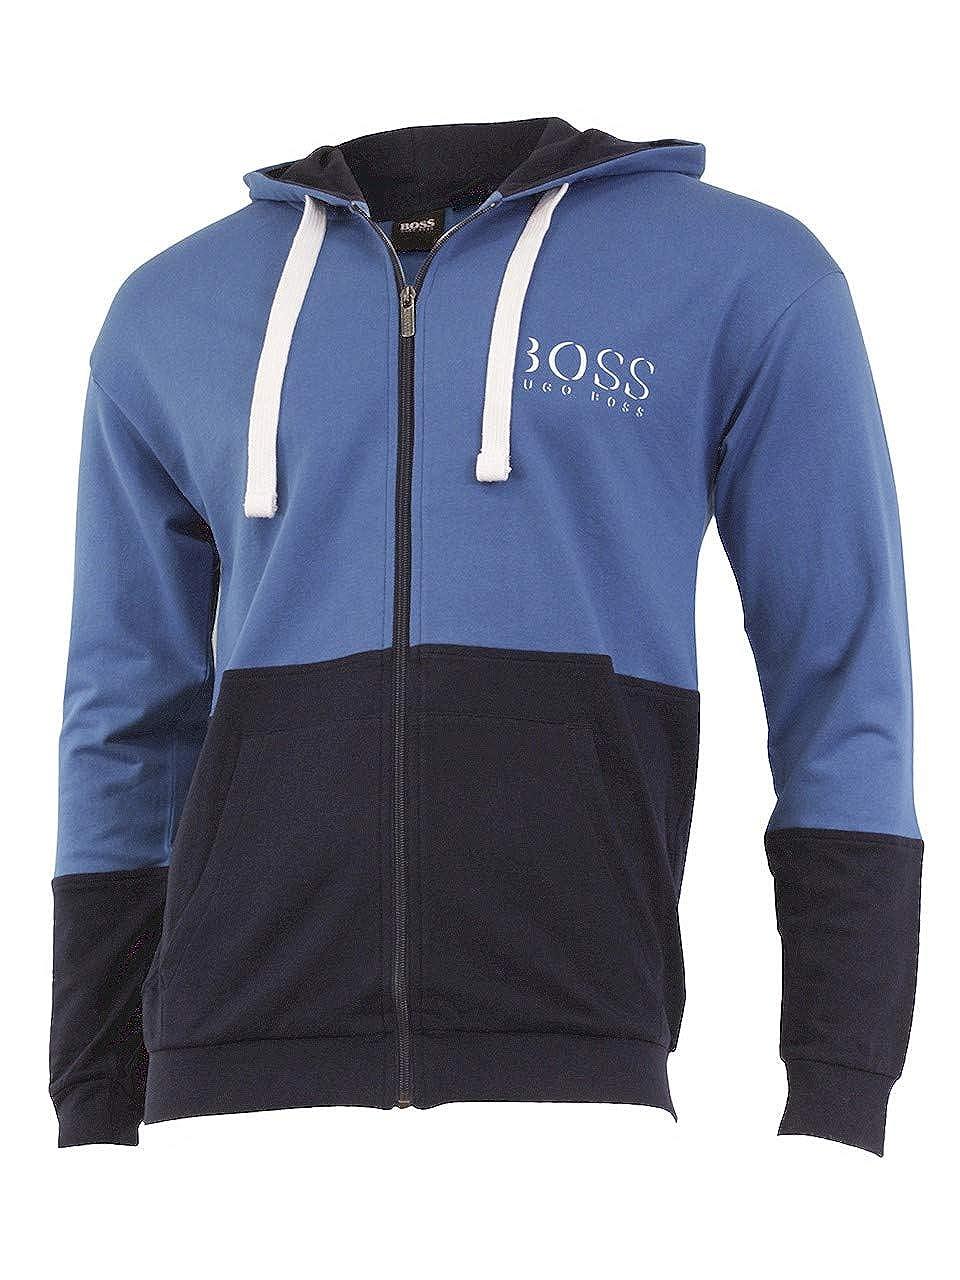 Hugo Boss BOSS Mens Authentic Jacket